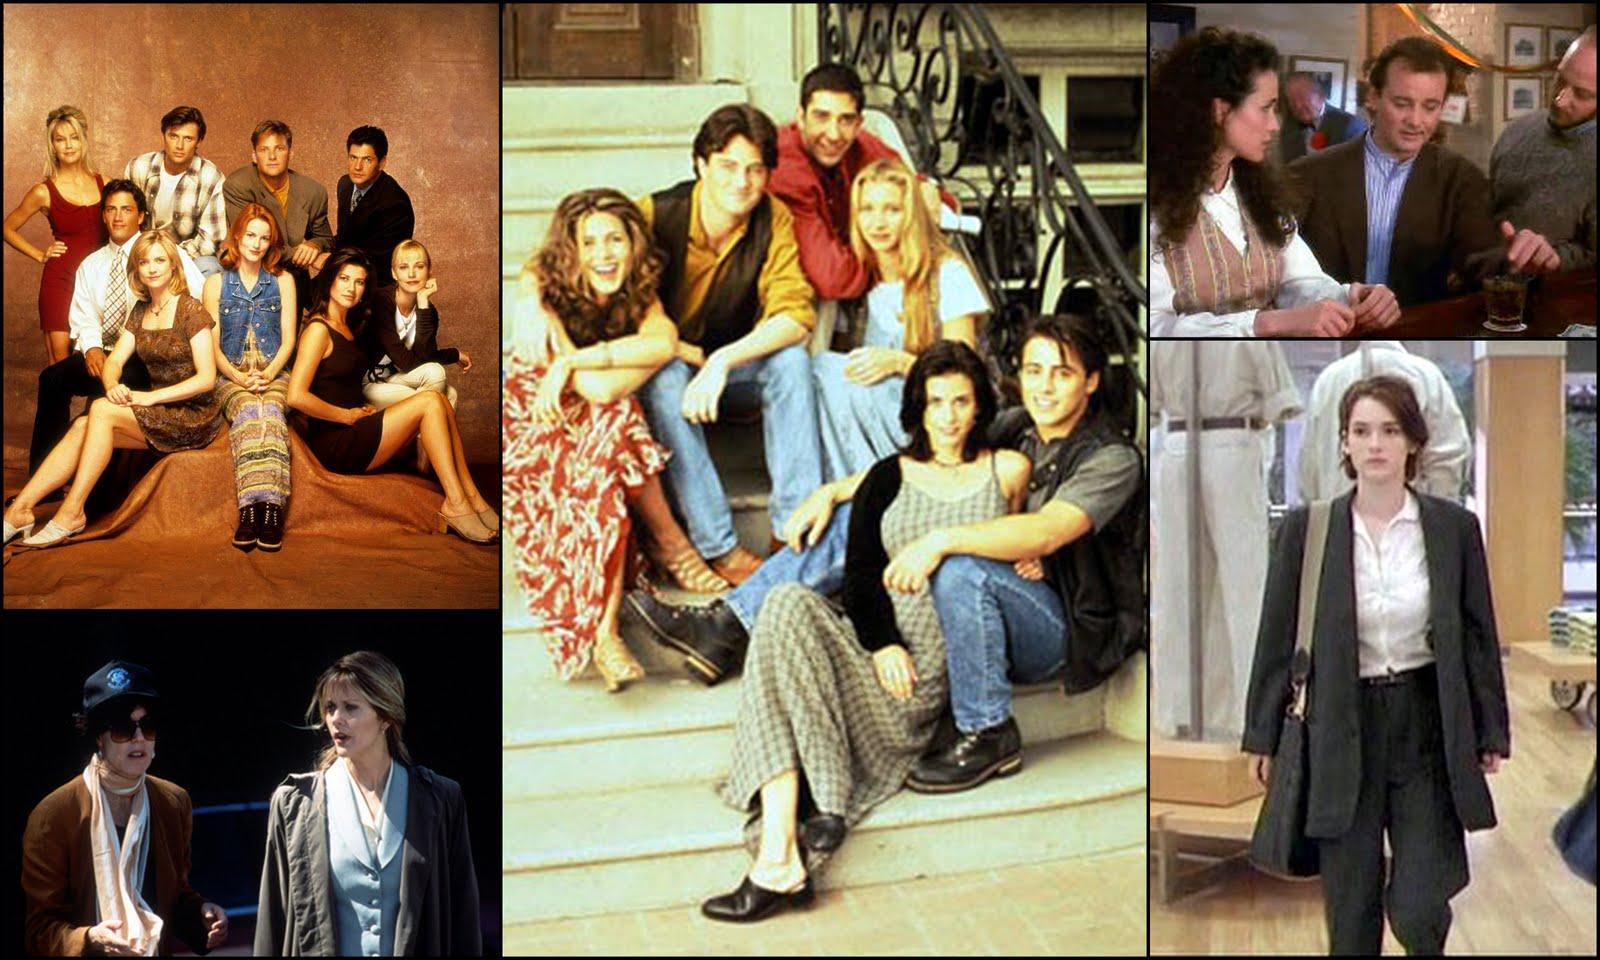 http://2.bp.blogspot.com/_Q5WSg7ukT6Y/THLgTeBg6uI/AAAAAAAAERw/ODycFzPBU0g/s1600/90s+look+tv+series+movies.jpg